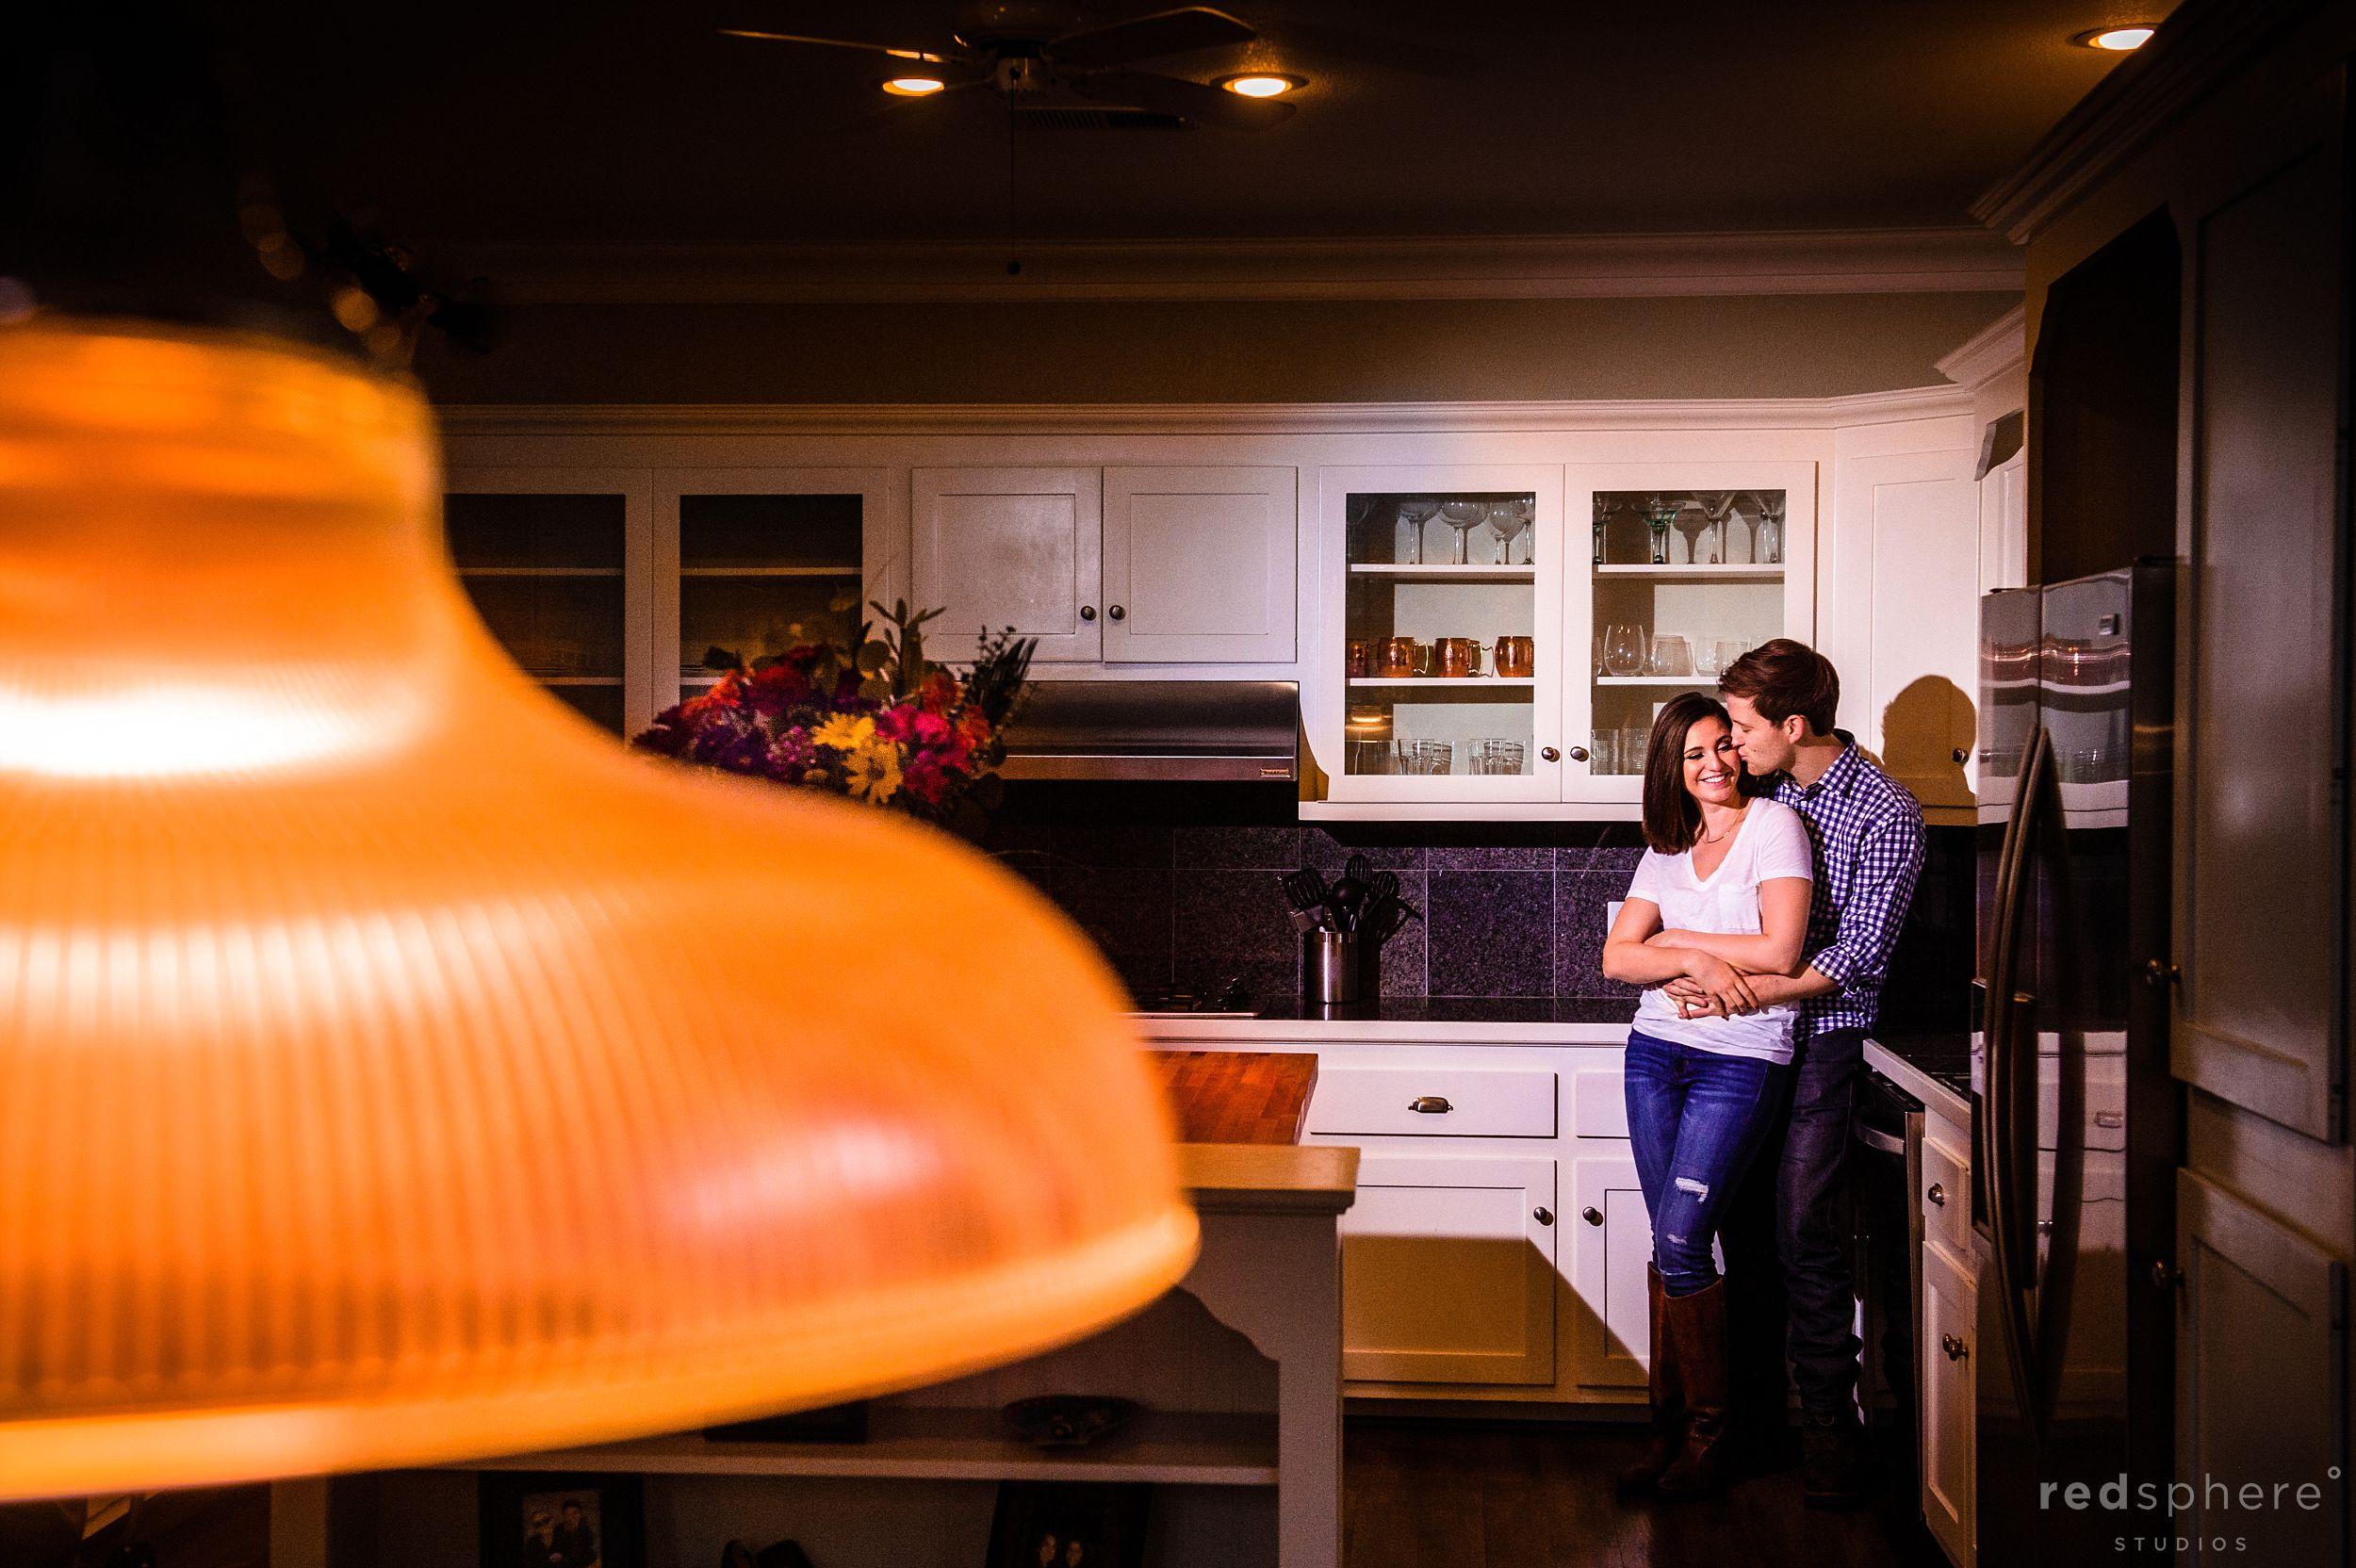 San Francisco Home Kitchen Engagement